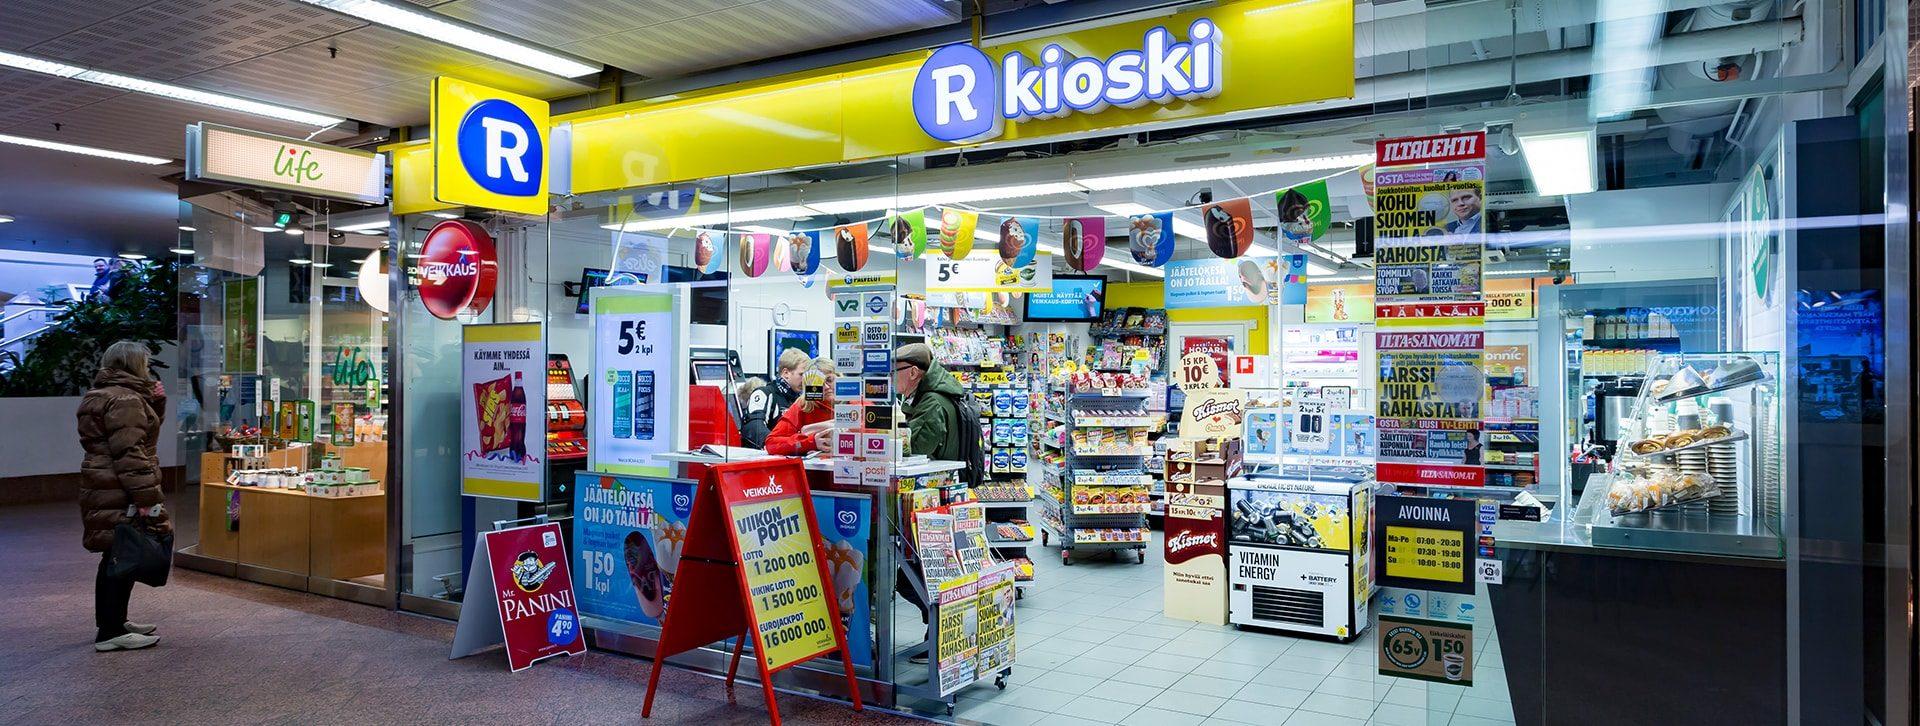 R Kioski Kaarina